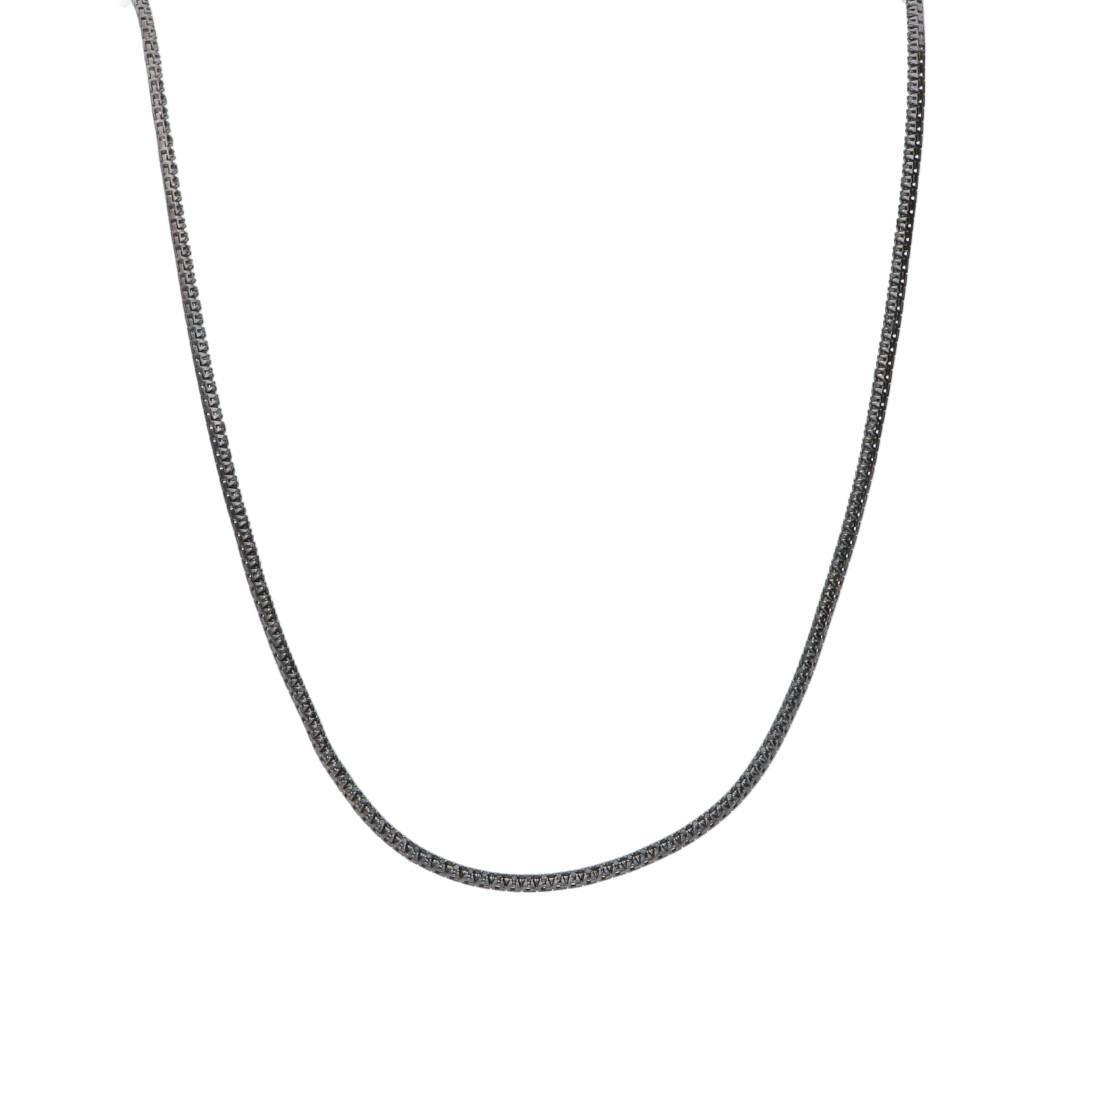 Collana tennis con diamanti neri - ALFIERI & ST. JOHN